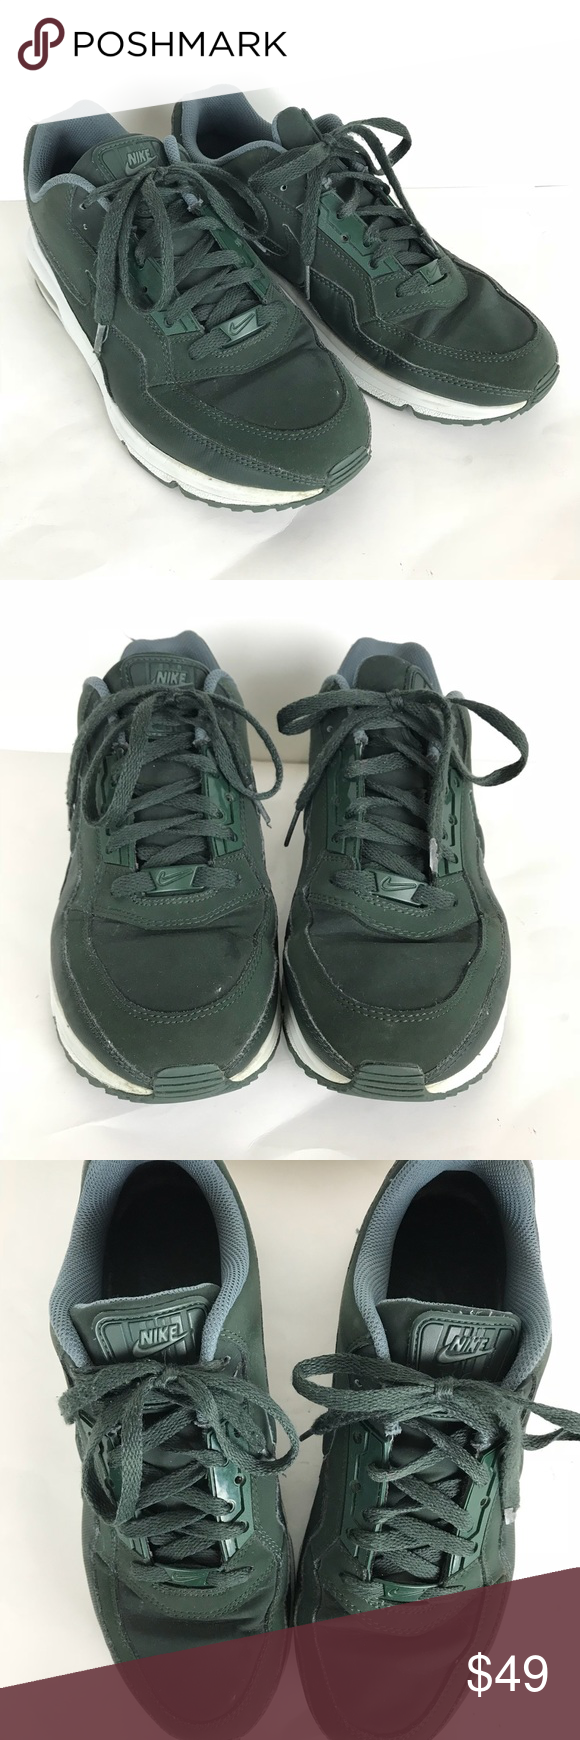 NIKE Air Max LTD 3 Mens Running Shoes Green 9.5